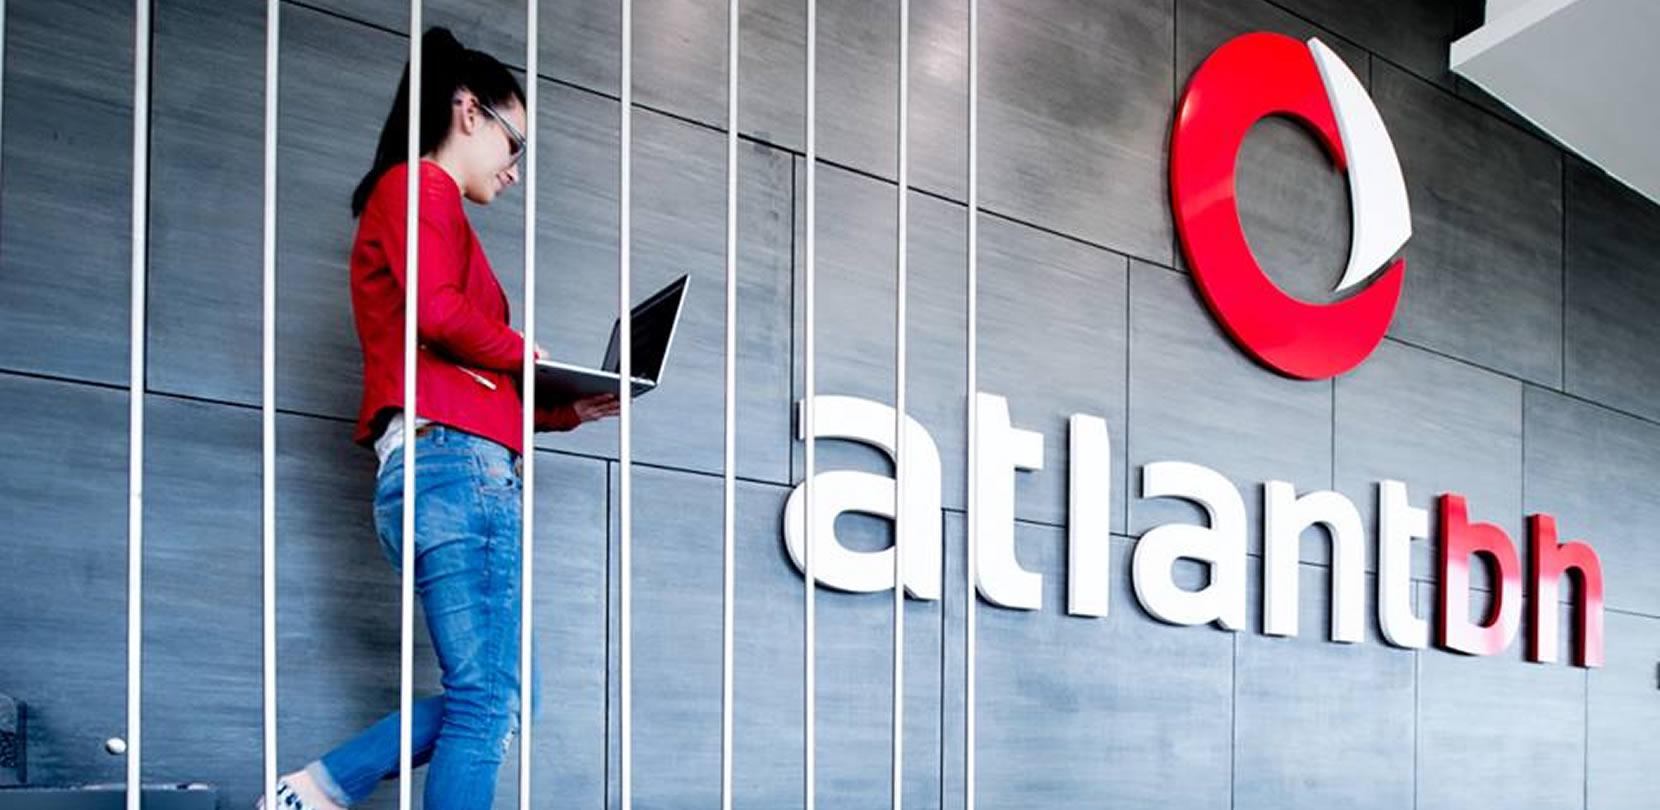 AtlantBH d.o.o. posao, karijera, iskustva radnika - kazoze.com